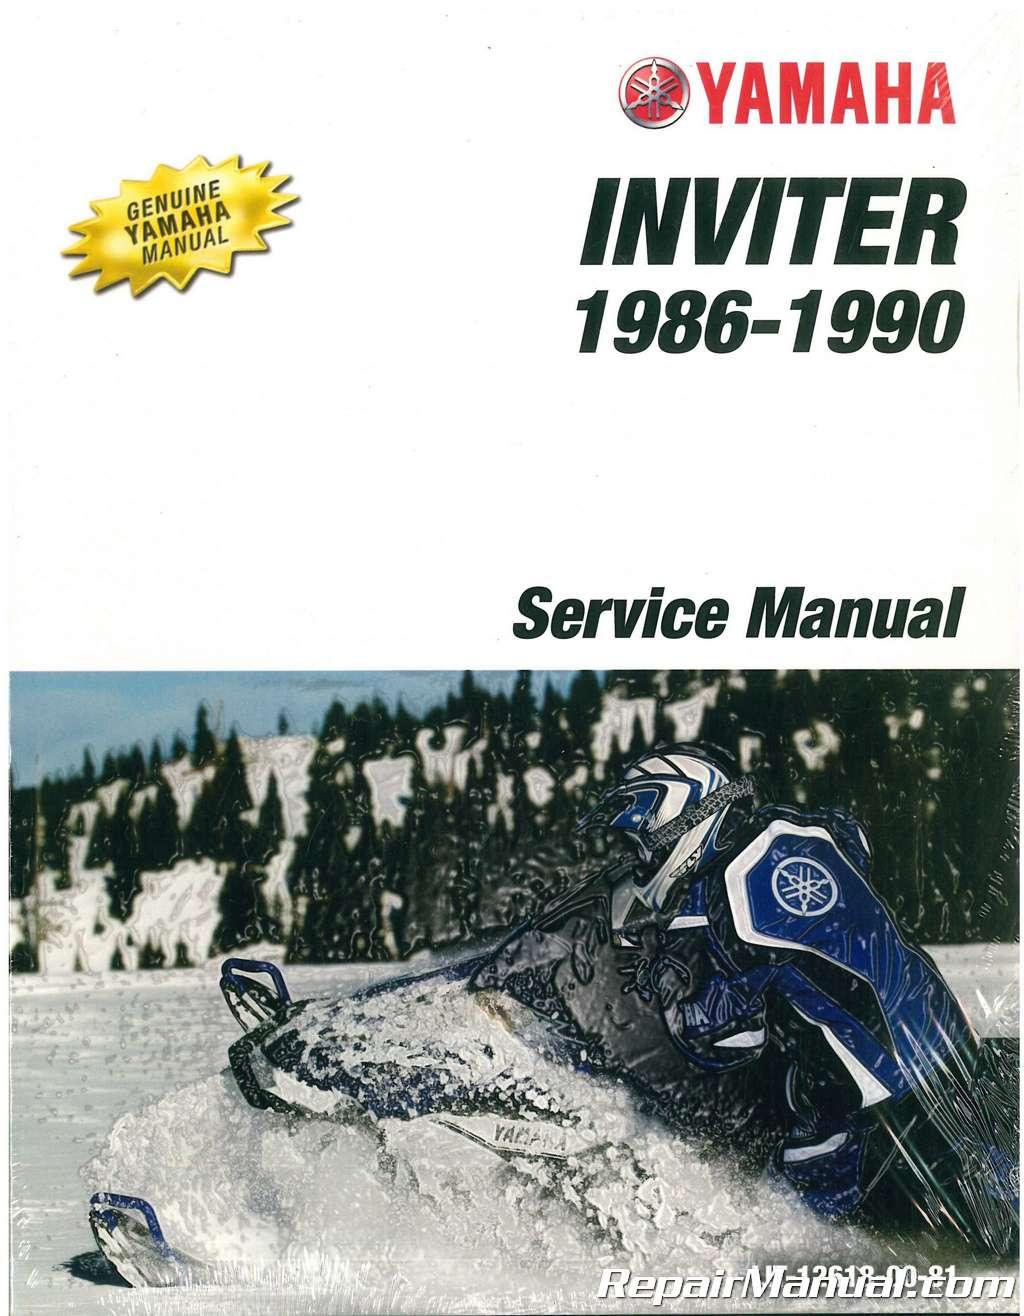 1987 1990 Yamaha Inviter Cf300 Snowmobile Service Manual